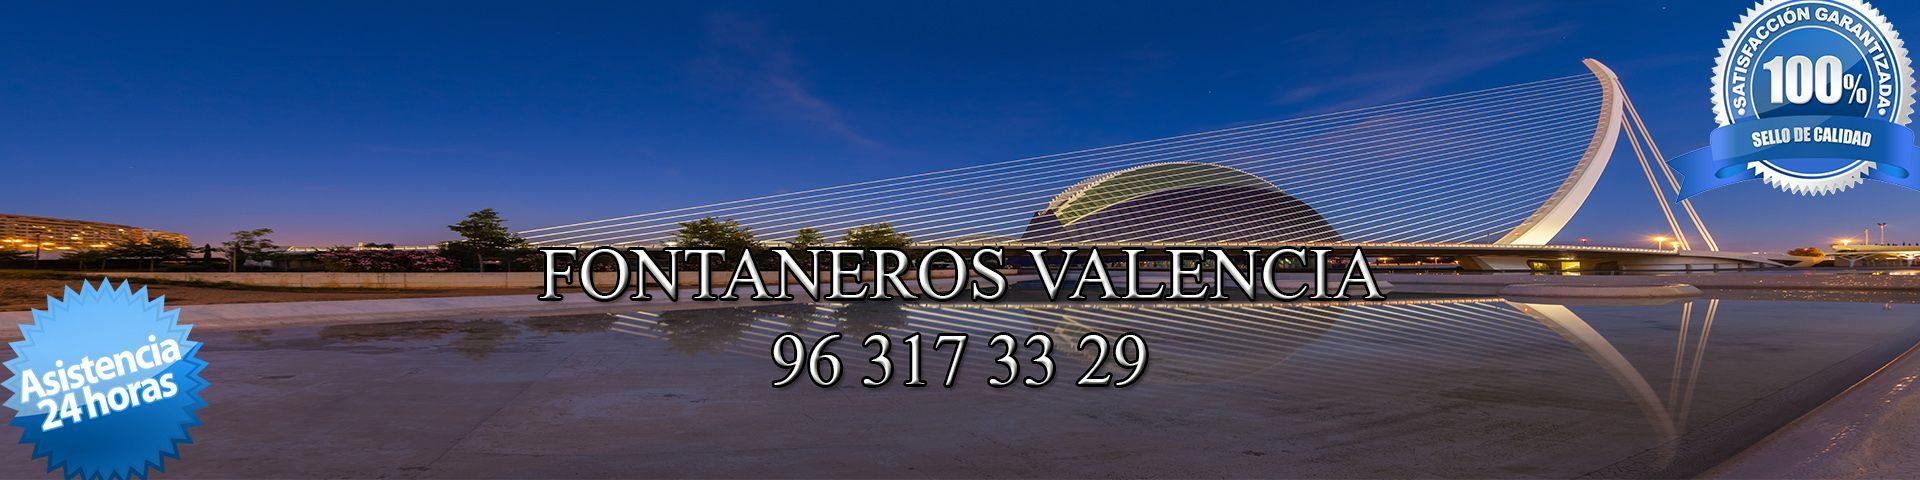 Fontaneros Valencia